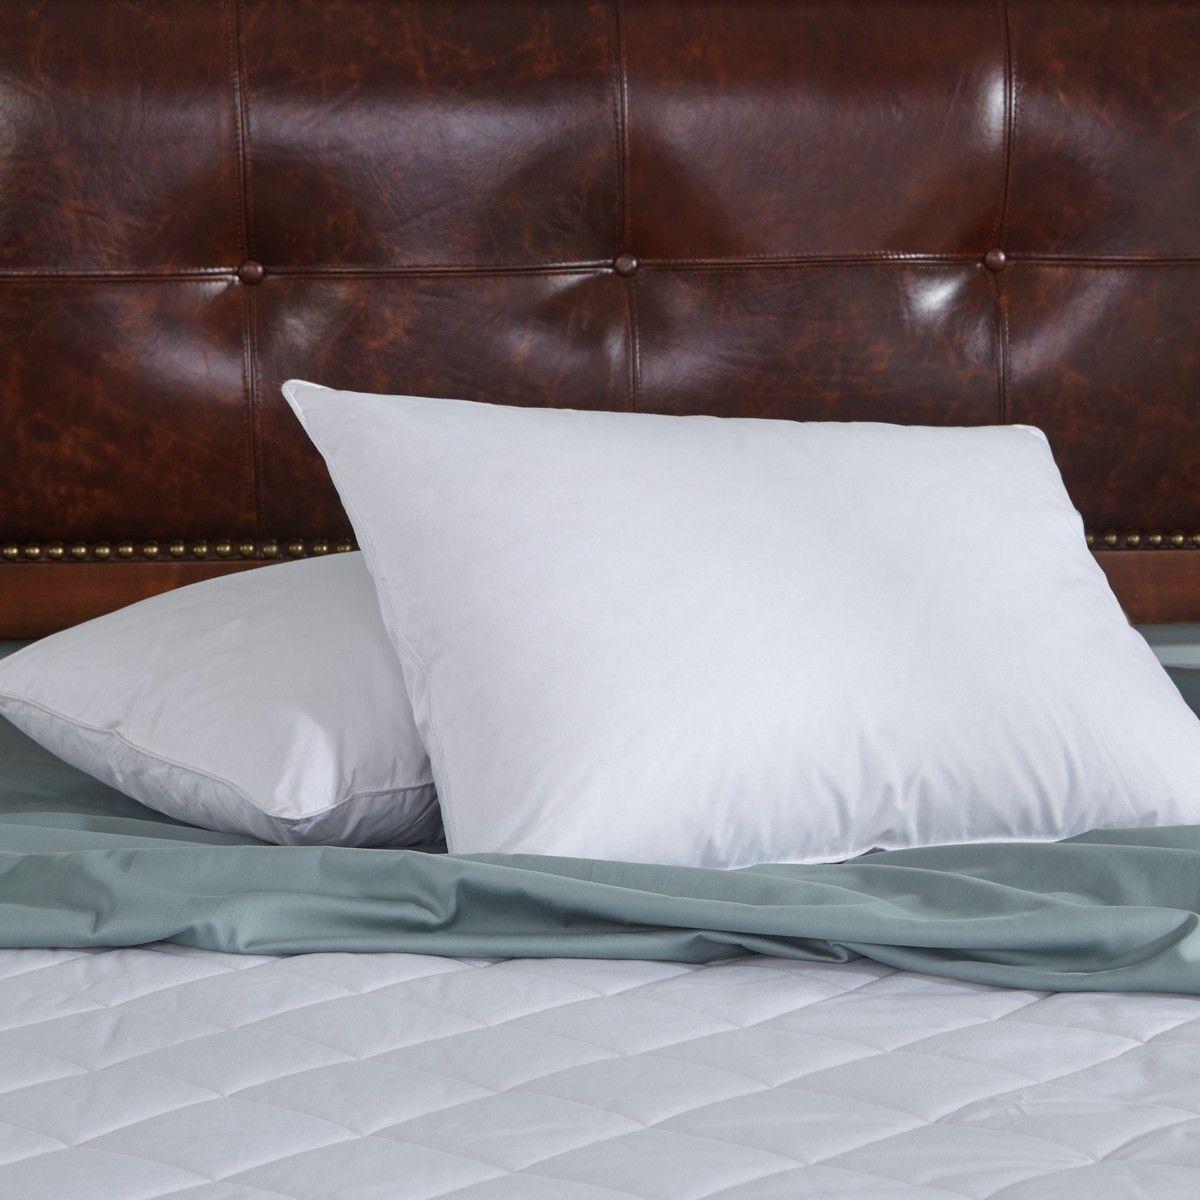 Feather Pillow Pillows, King pillows, Bed pillows